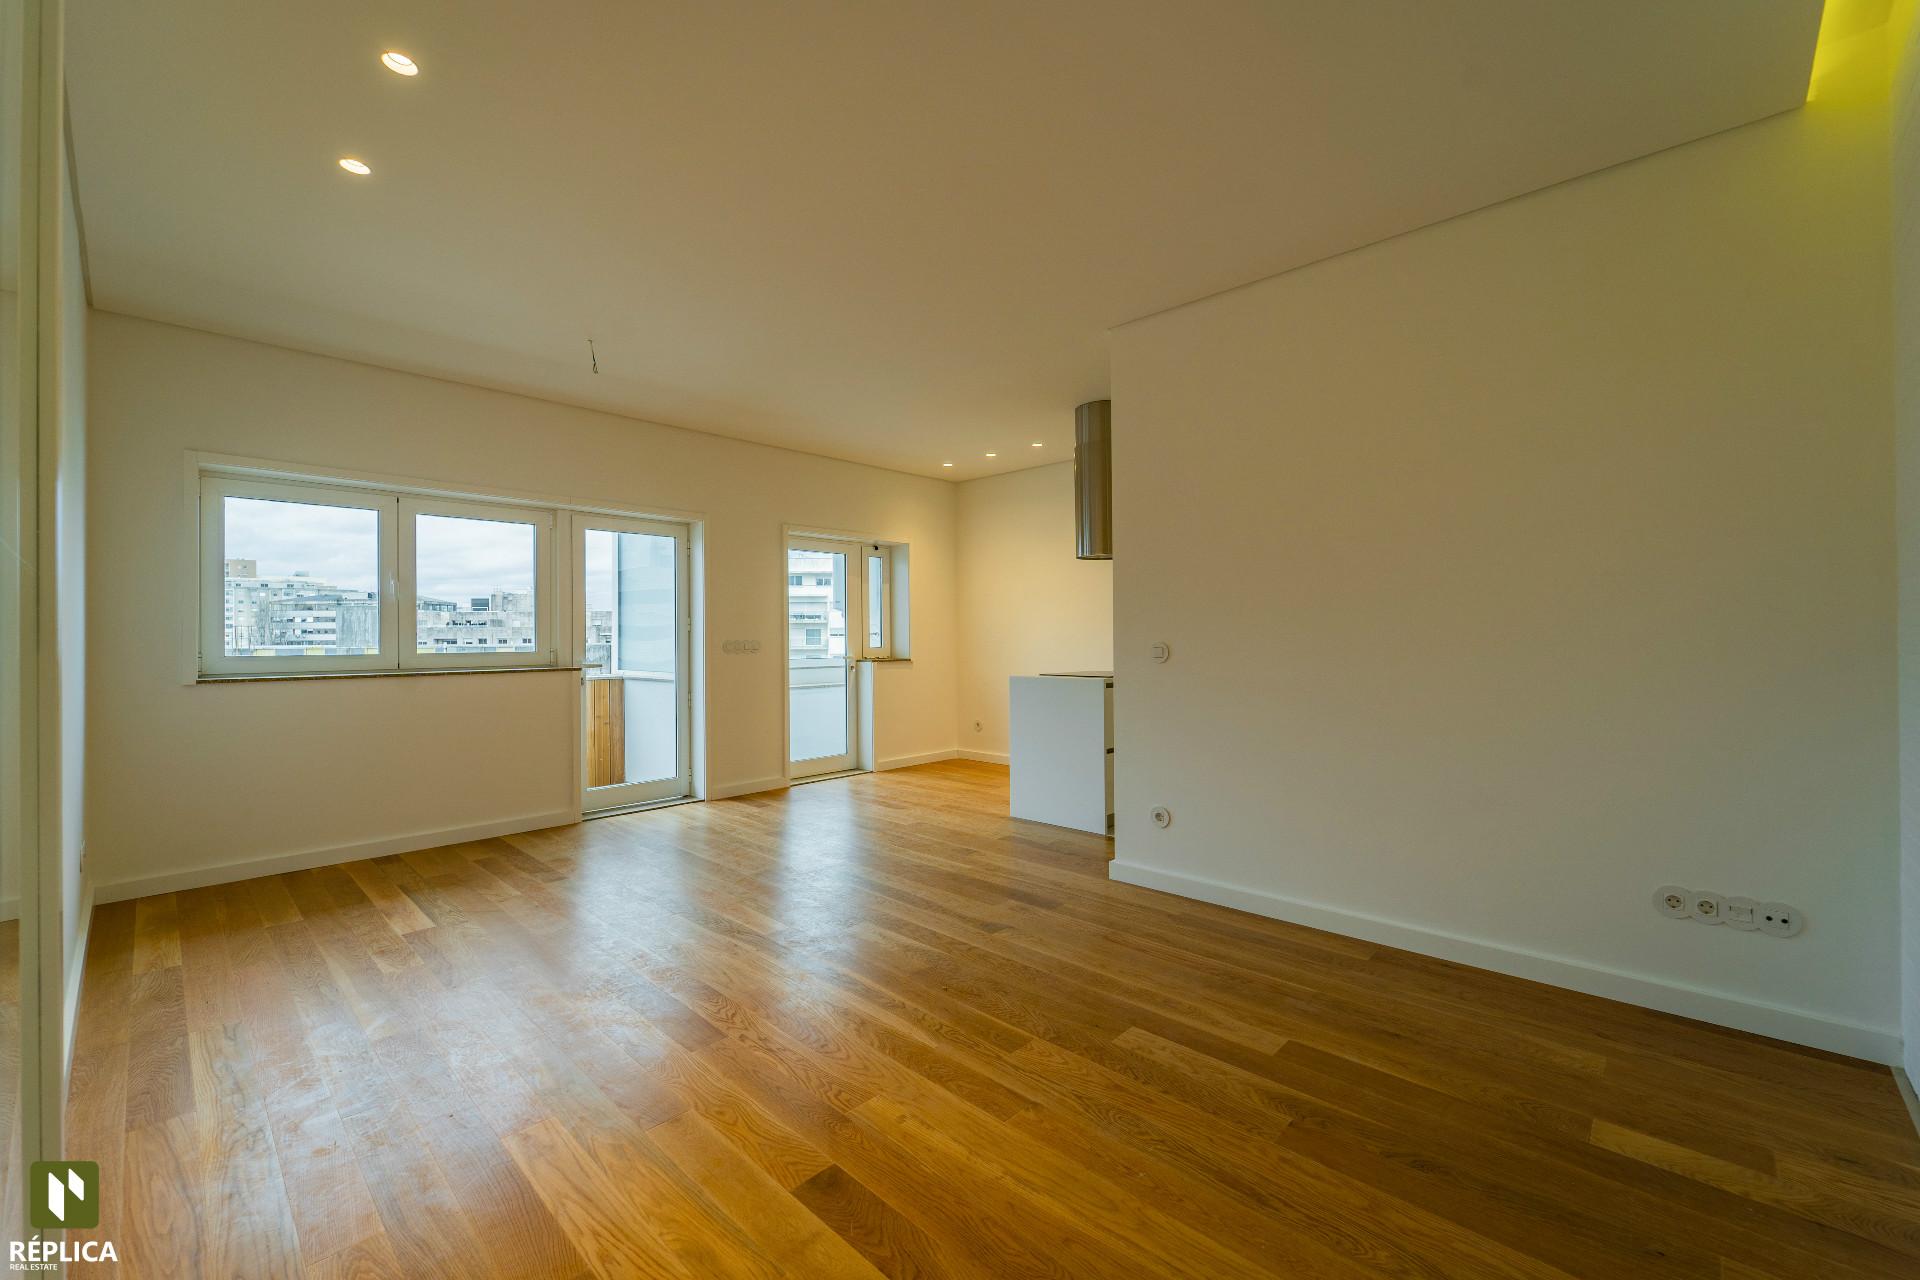 Apartamento T3 Remodelado, Boavista